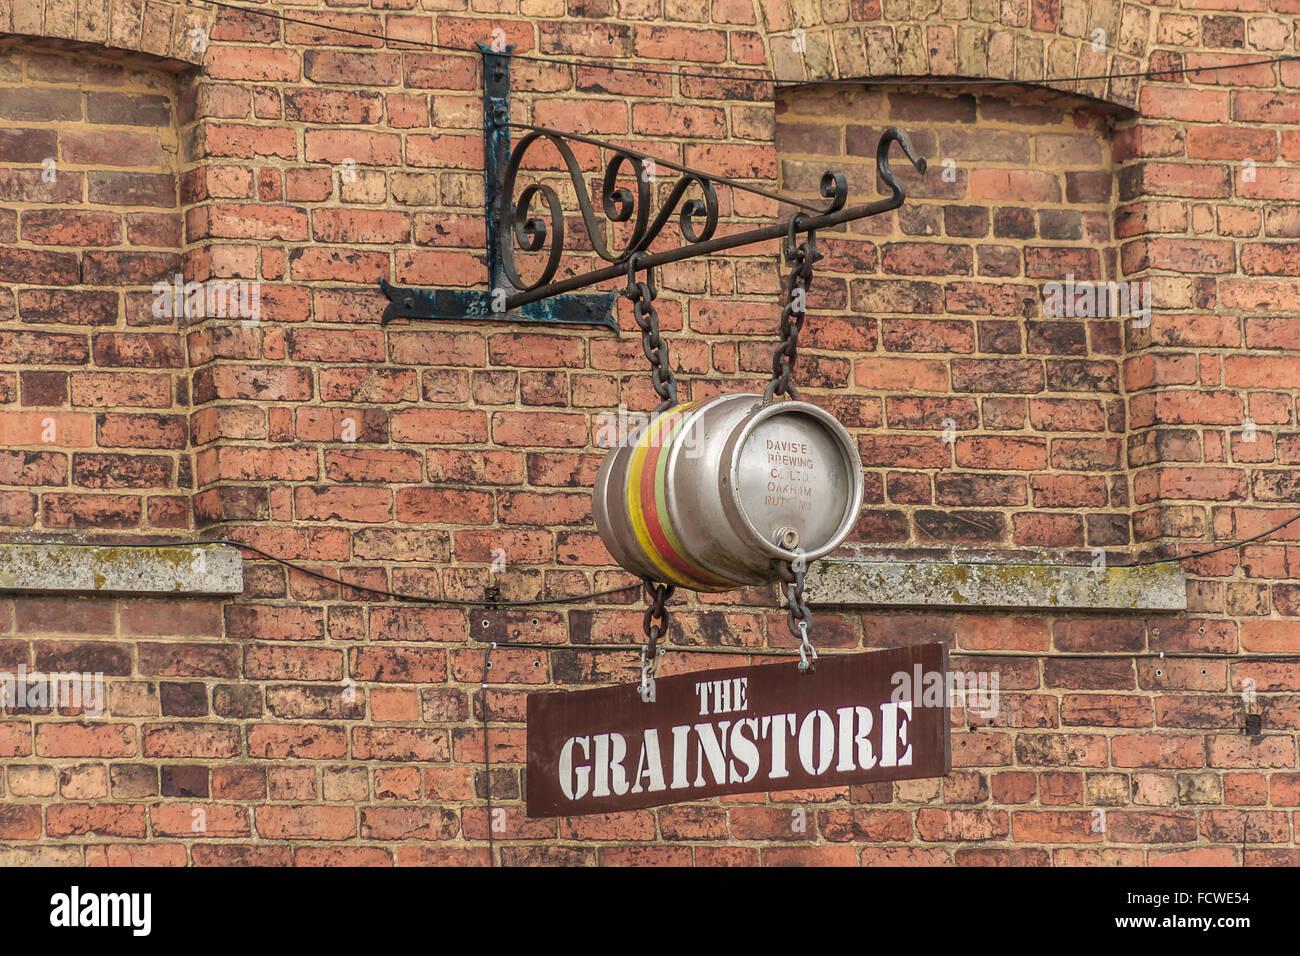 Oakham, Rutland, UK. 25th January 2016. The sign outside the Grainstore pub and microbrewery in Oakham, Rutland, - Stock Image